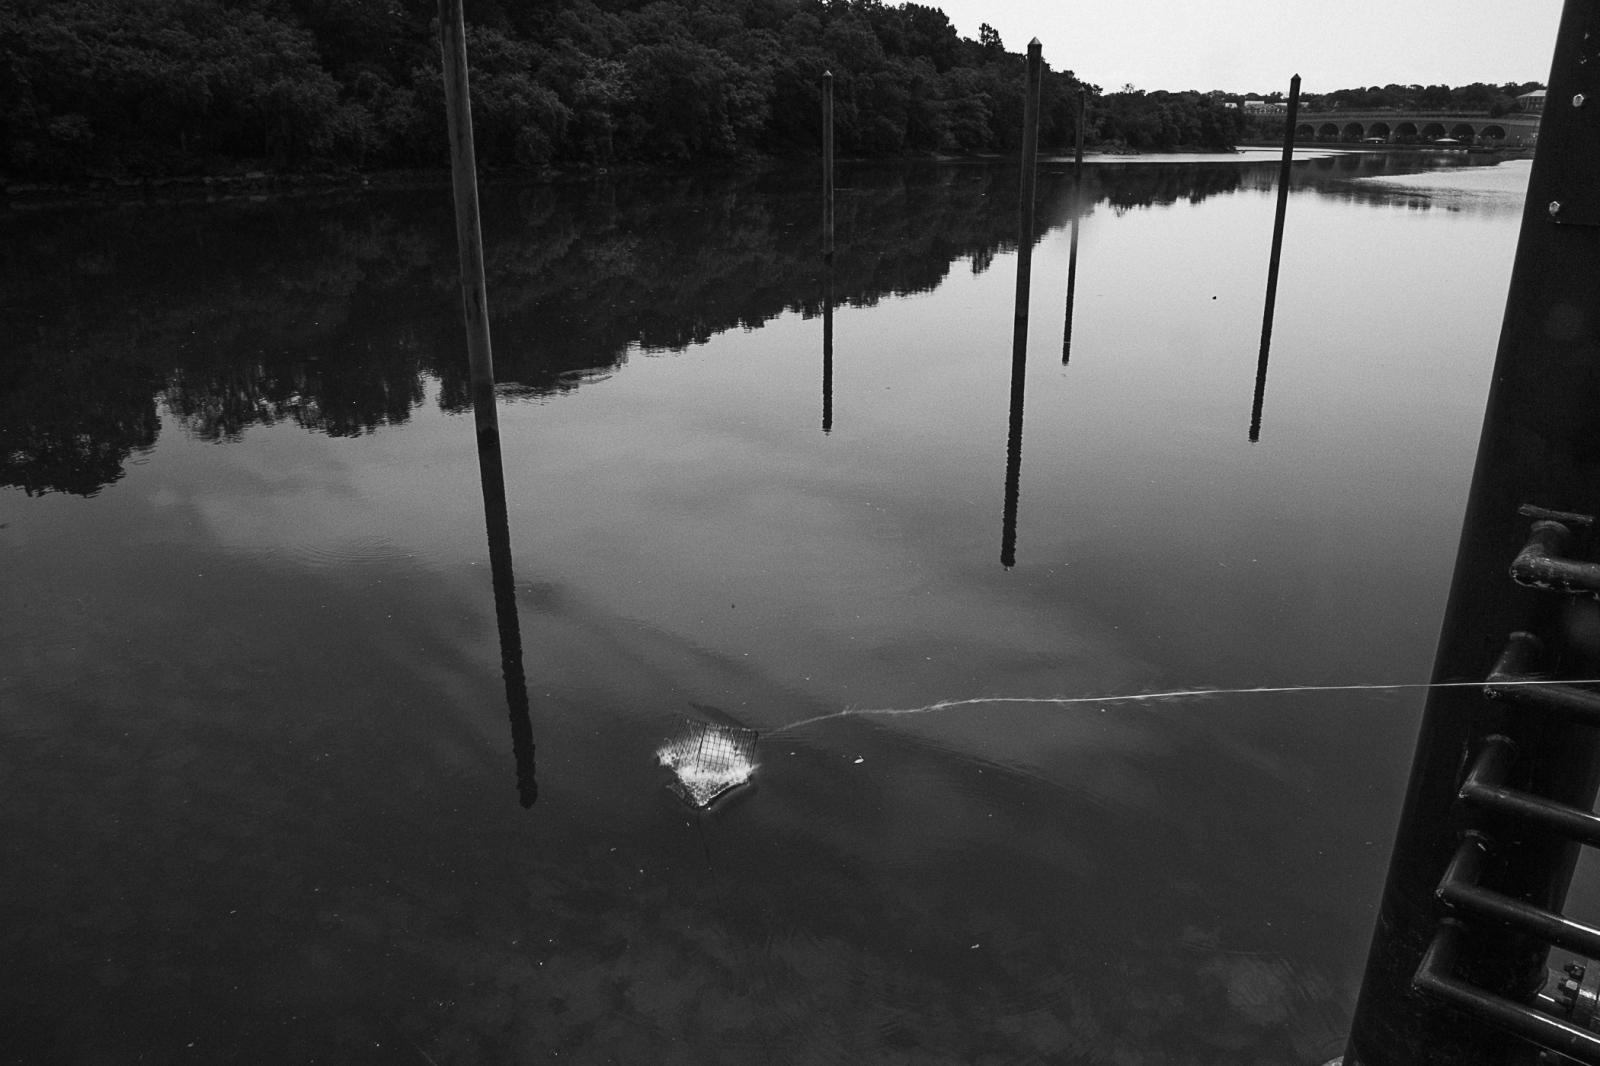 Art and Documentary Photography - Loading SebastianZuletaRios_LenteTrinchera_8Y6A411601722_de_julio_de_2017.jpg